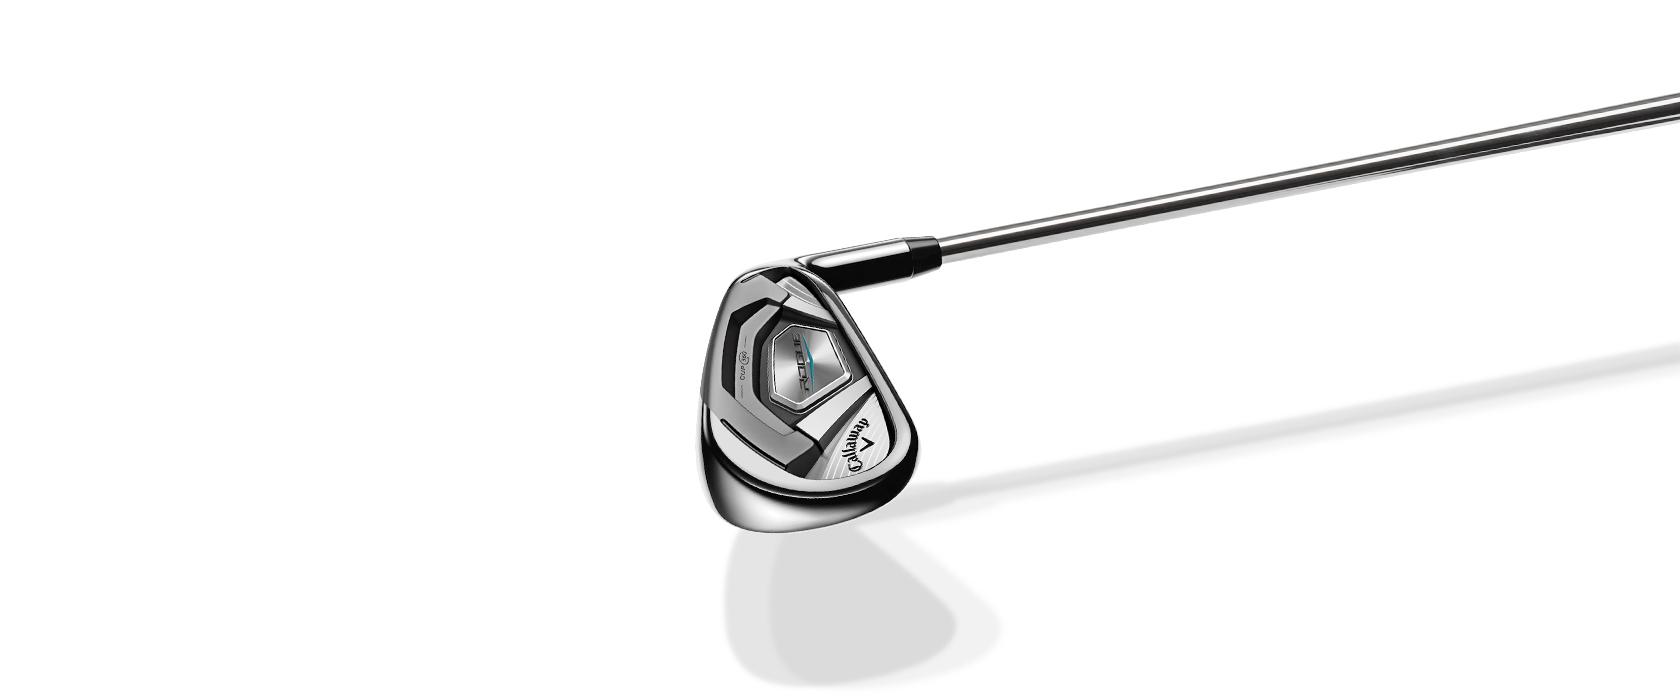 iron anniversary gifts rogue golf iron callaway